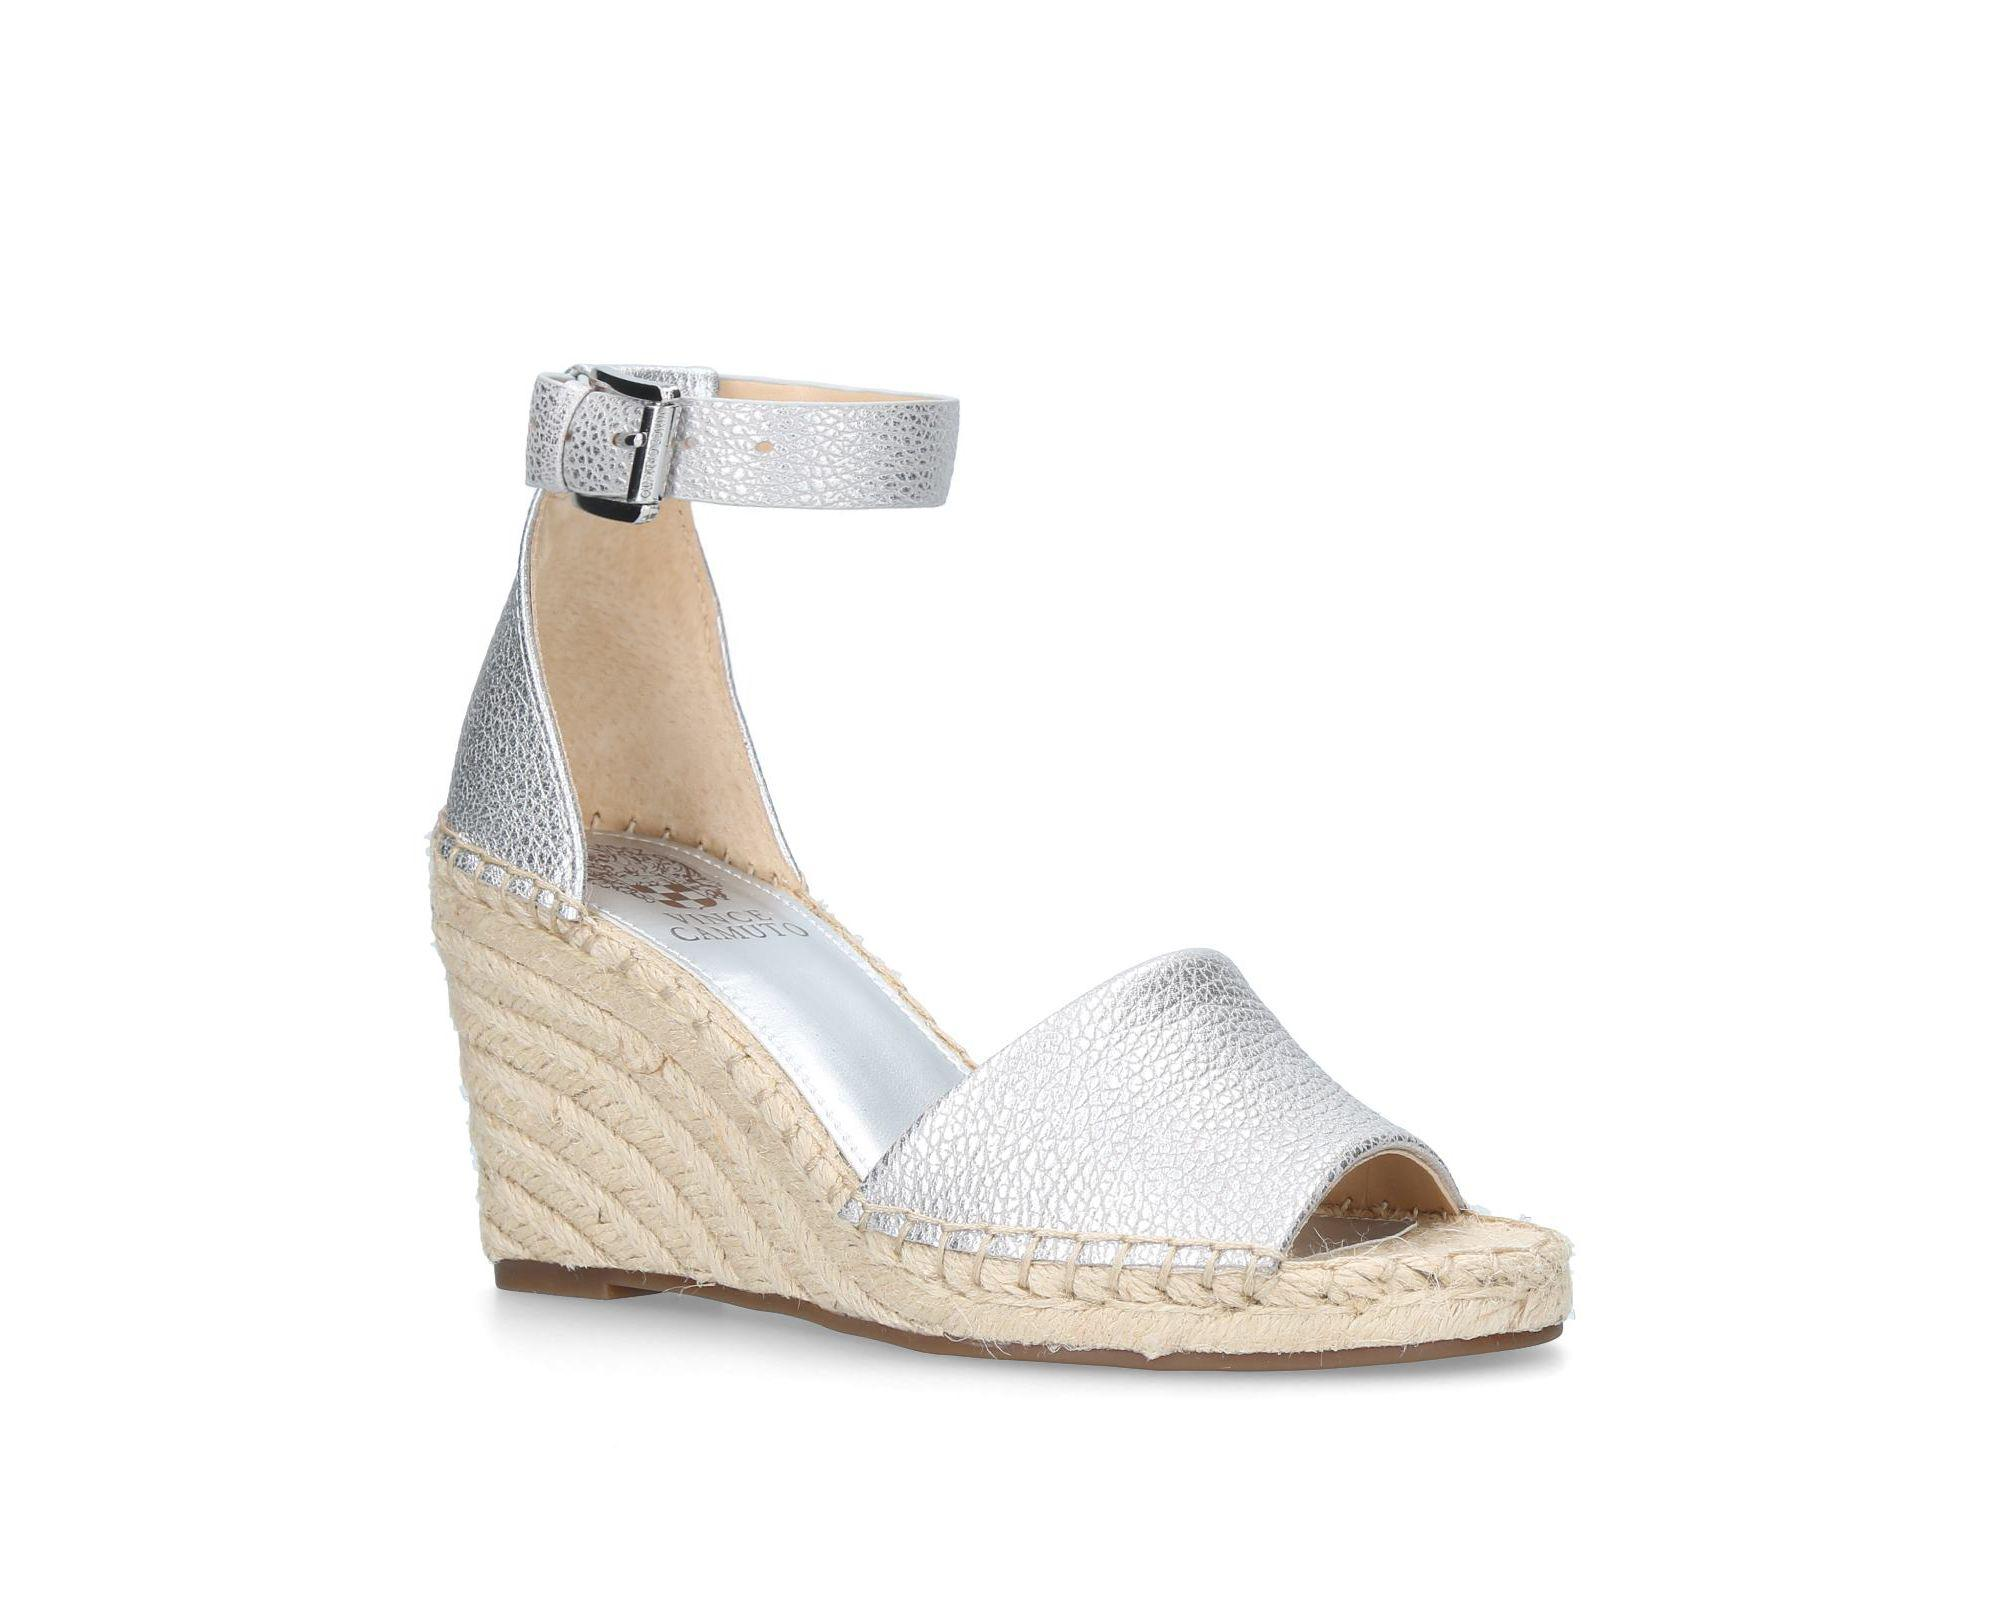 1ab7bdb18ed4 Vince Camuto Silver  leera  High Wedge Sandals in Metallic - Lyst